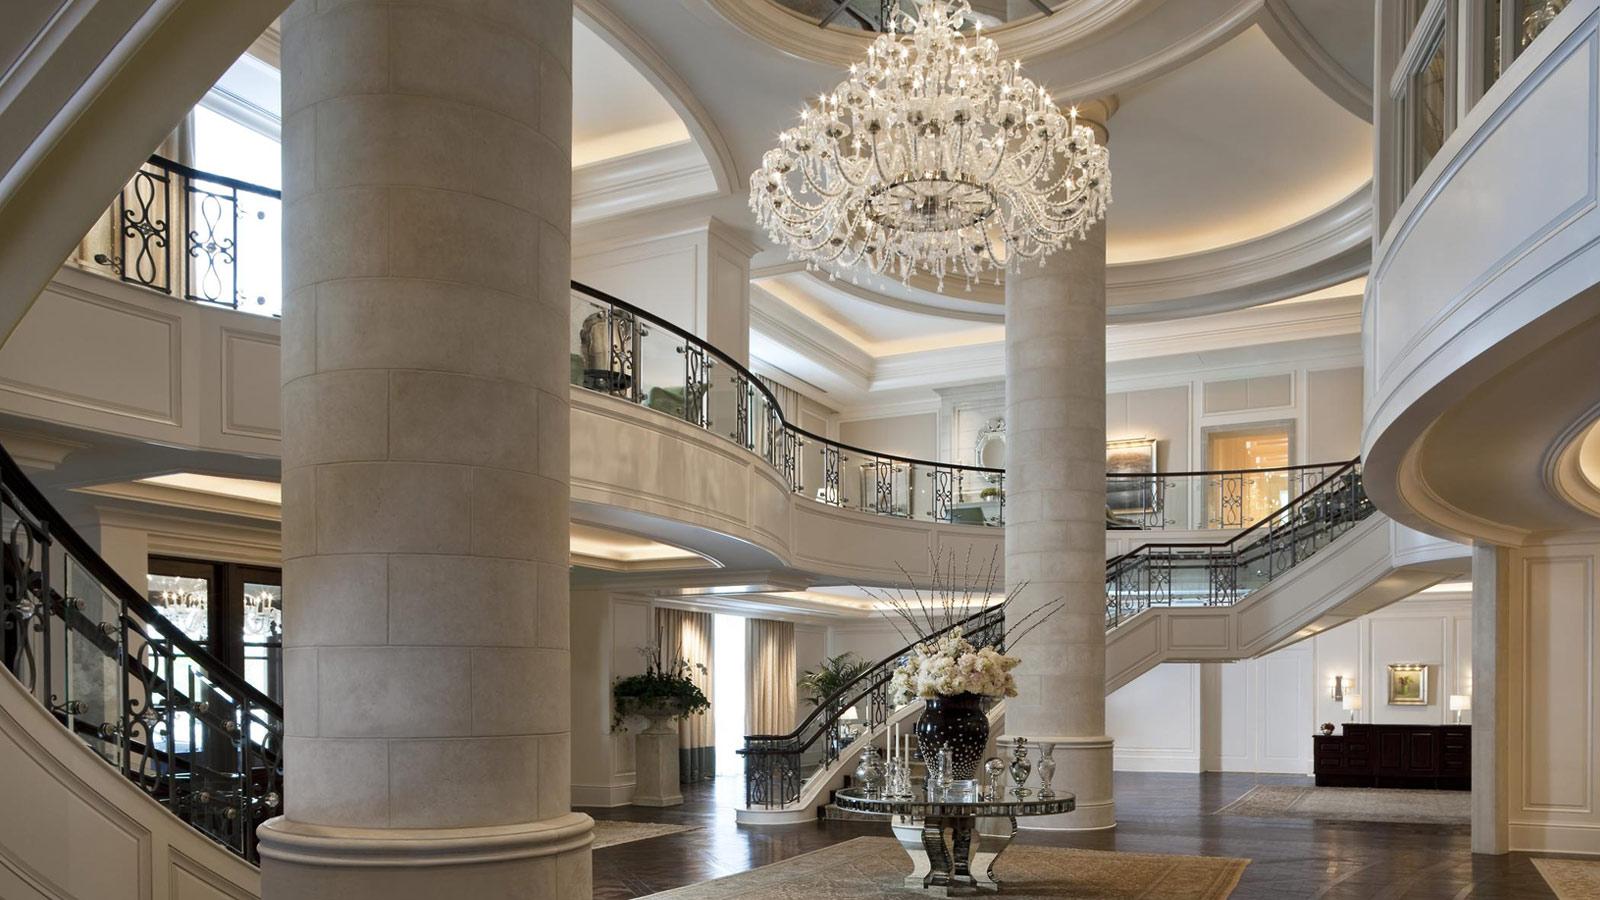 Executive House Hotel Chicago